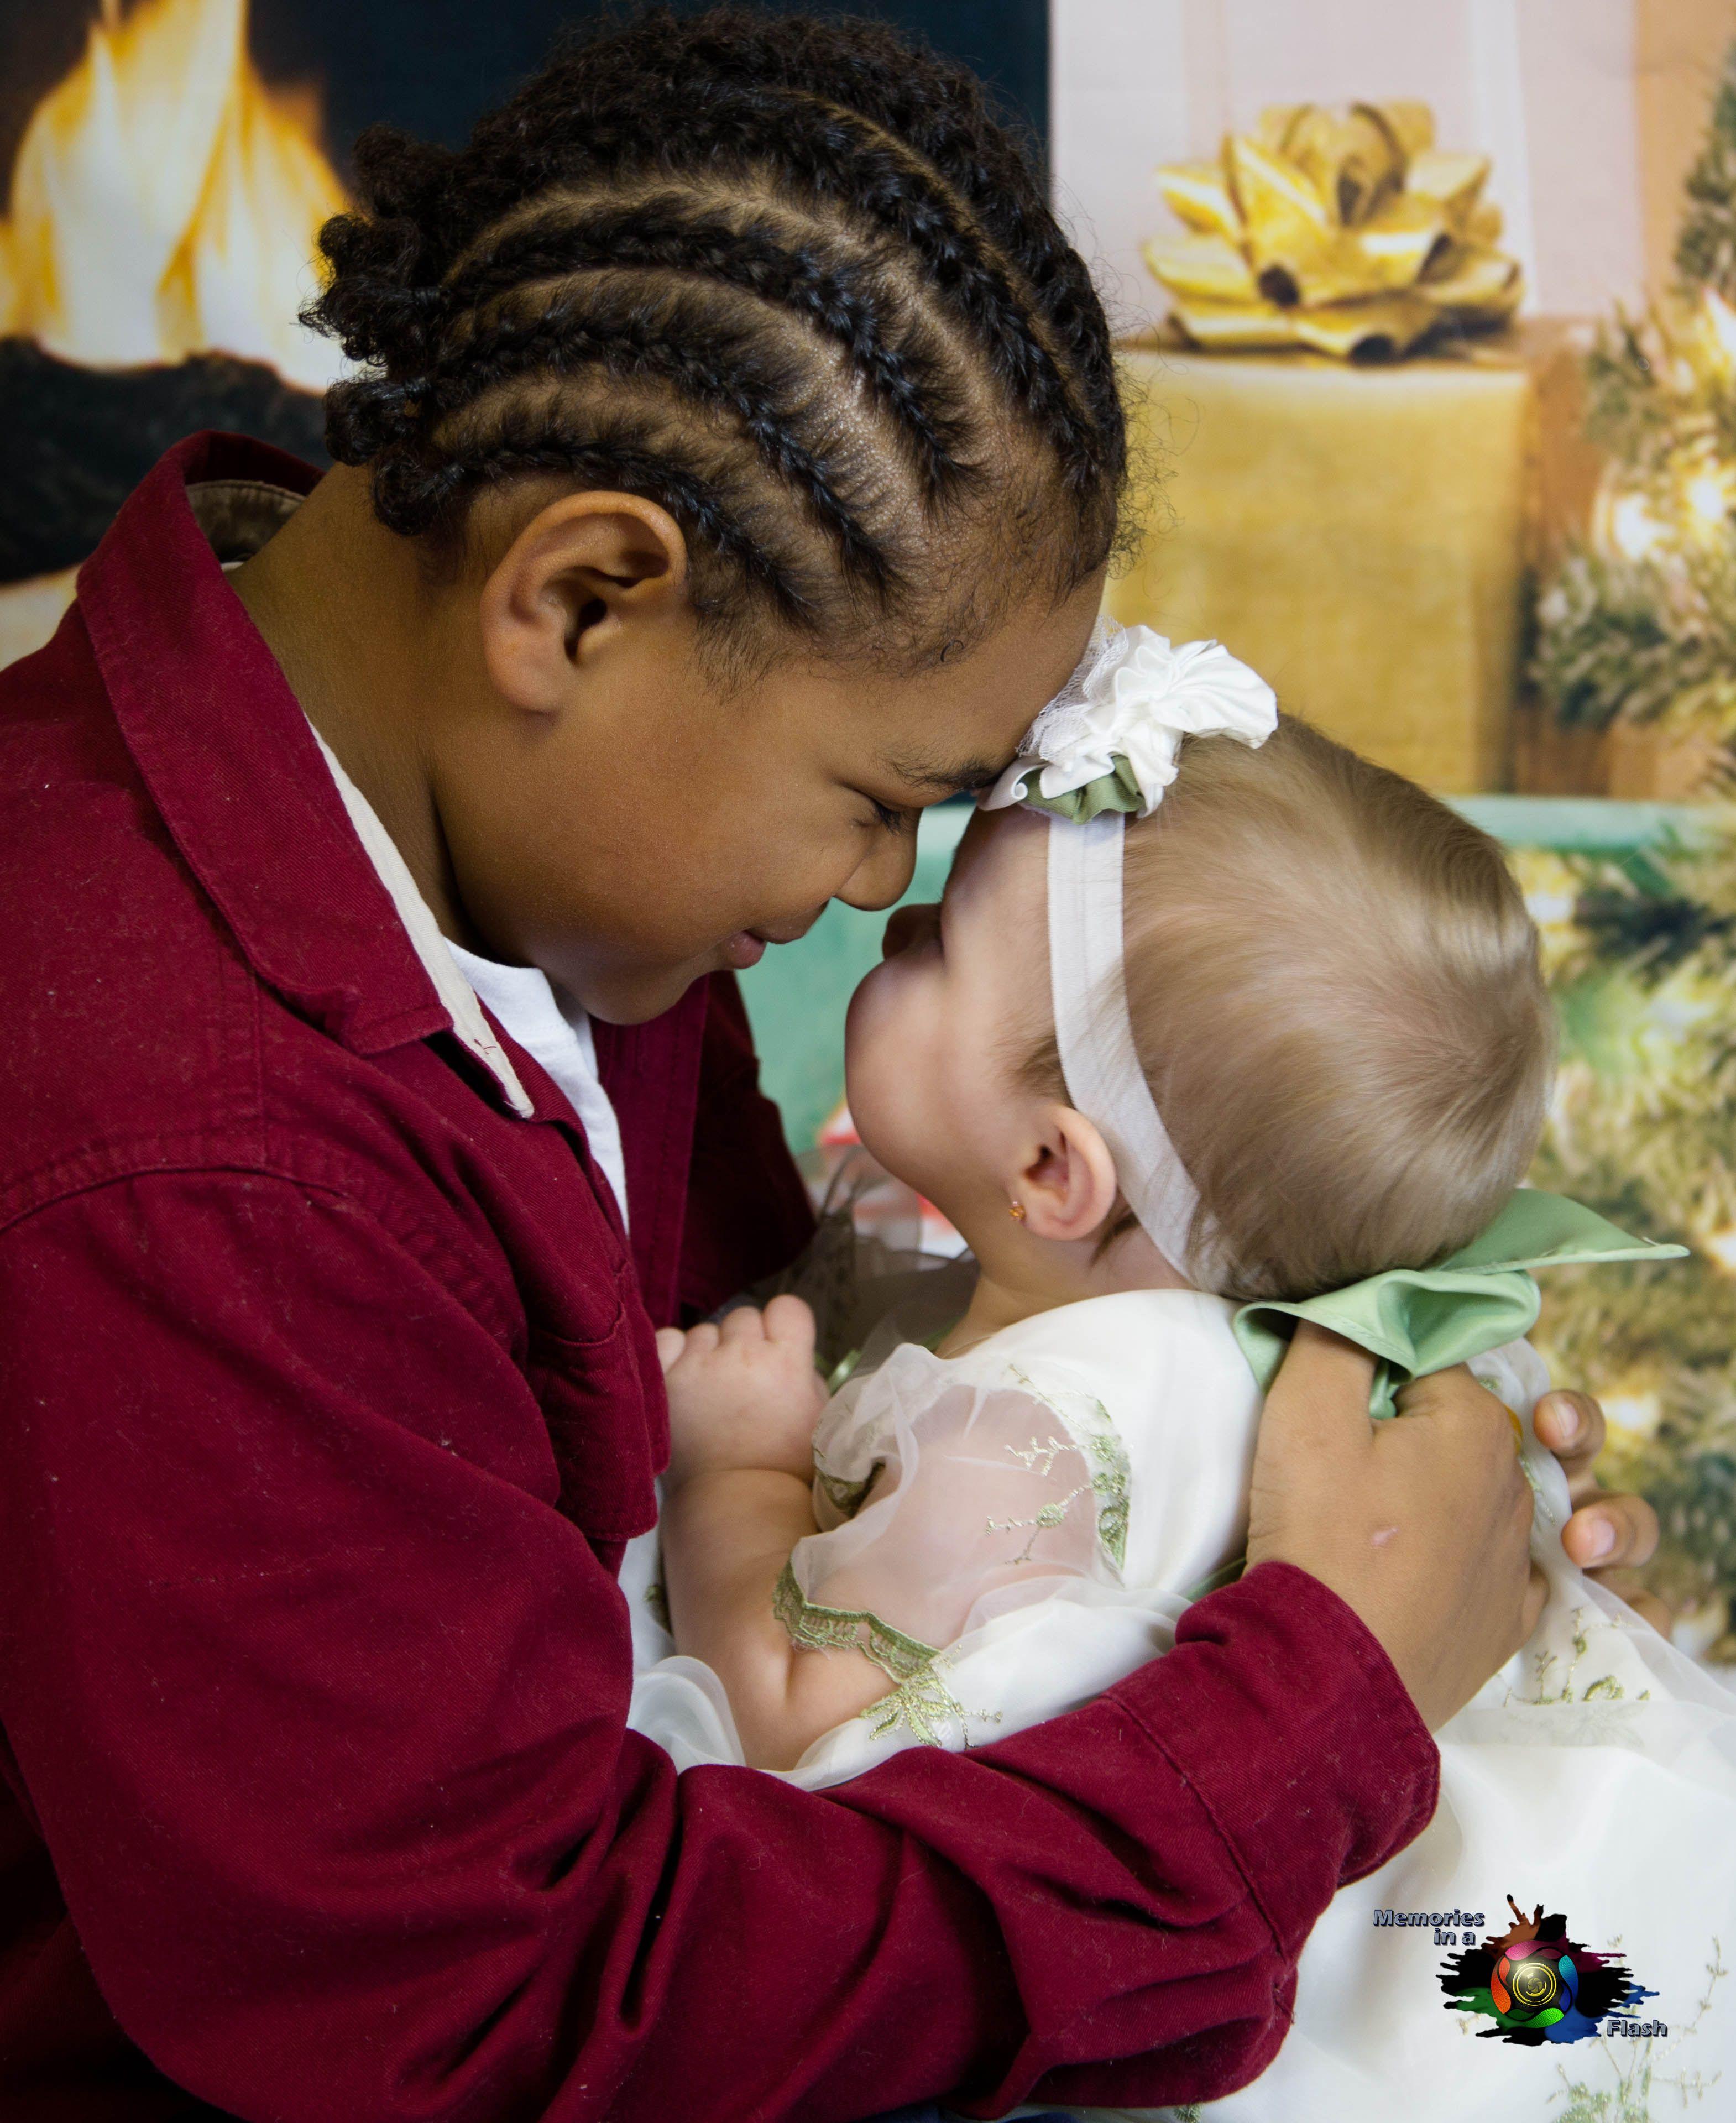 Southern Oregon Christmas Photography | Kristine Eldridge | Memories In A Flash | www.gpmemories.com